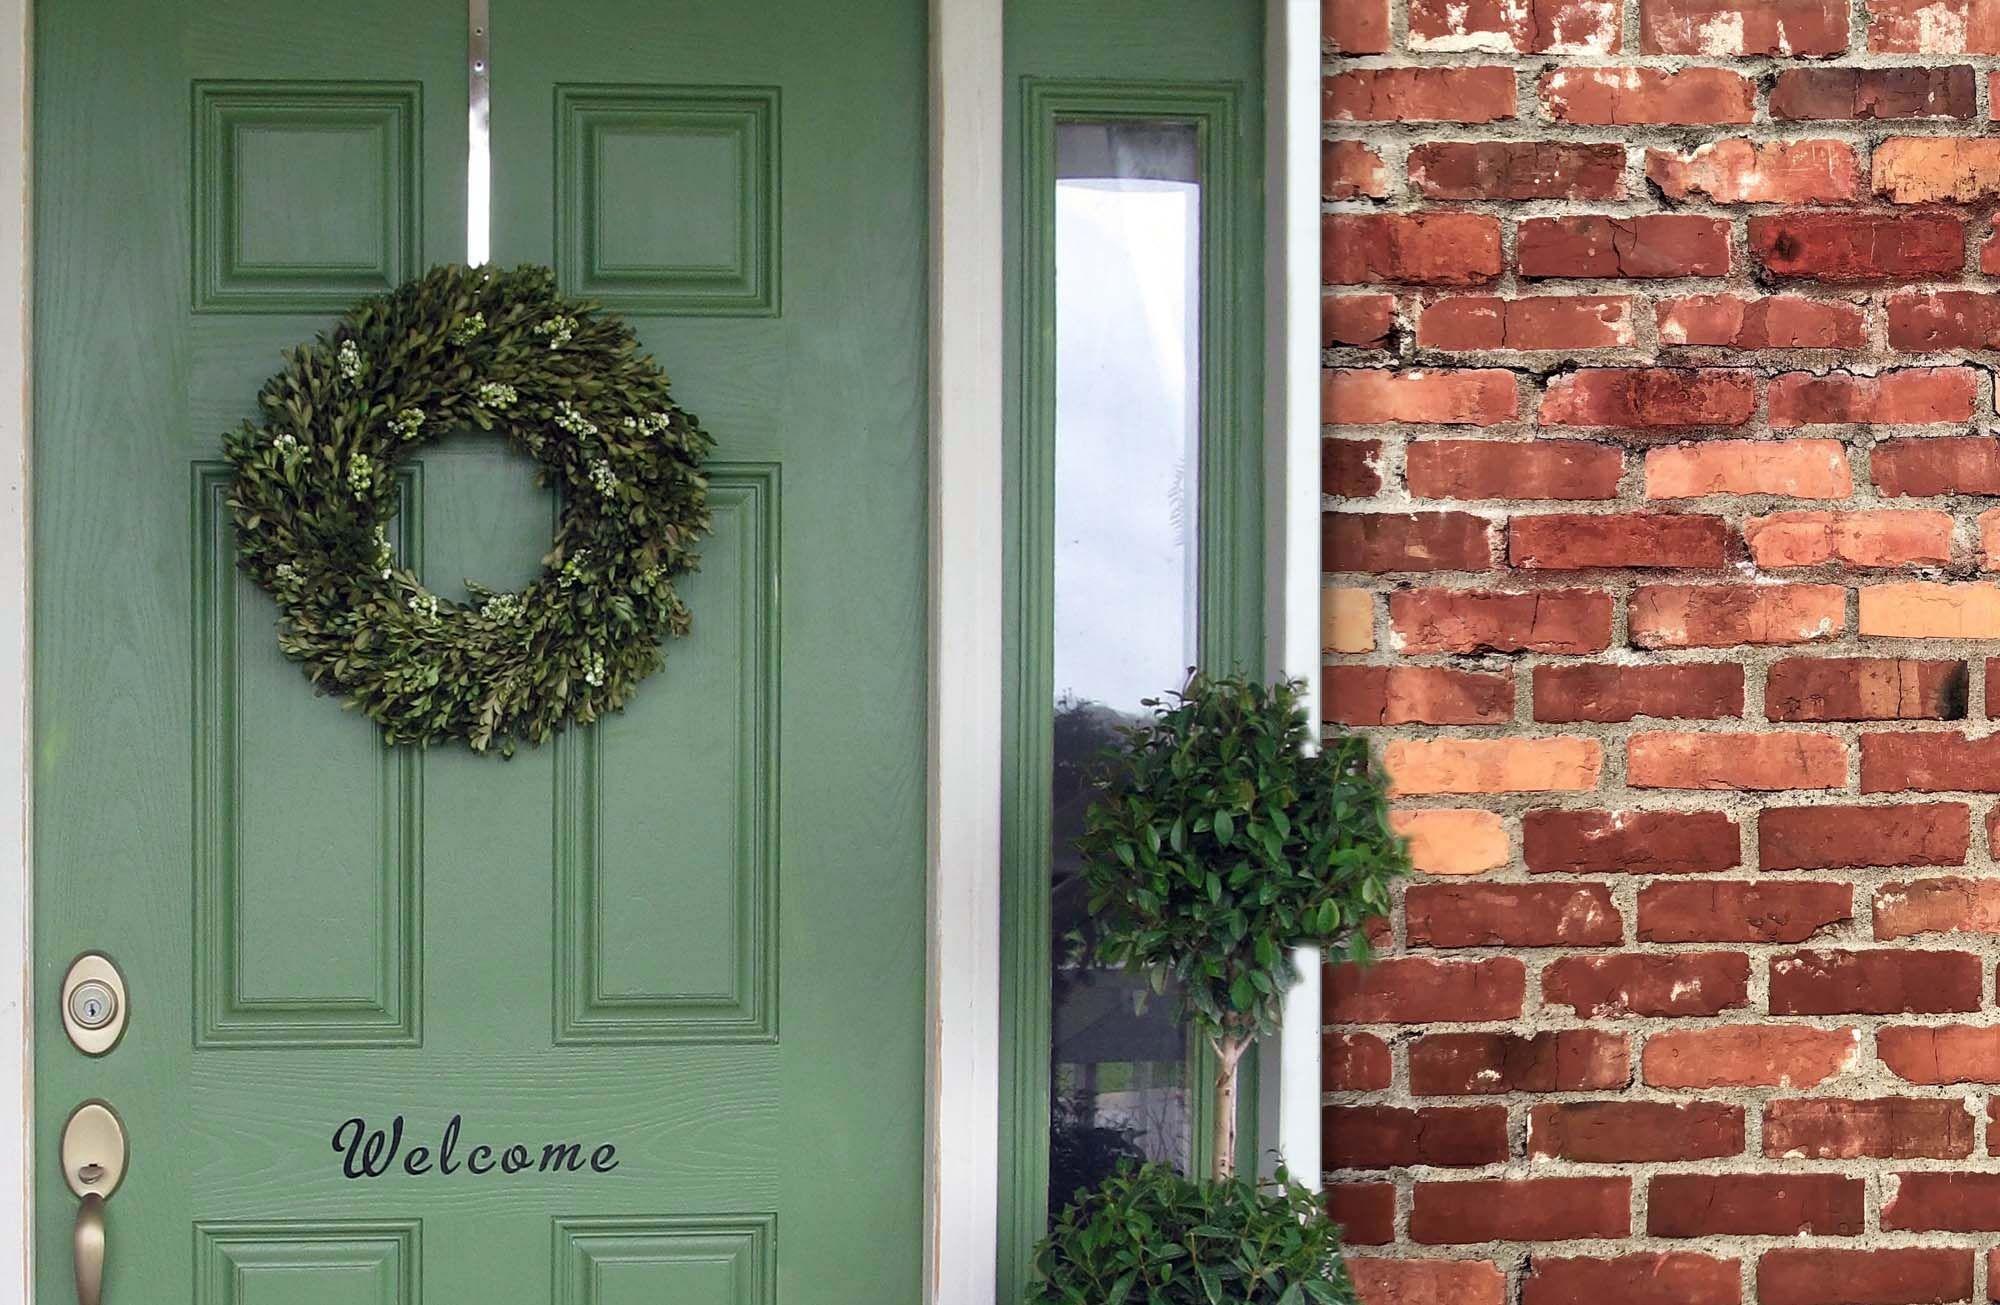 Green Front Door With Wreath Brick House Brick House Front Door Colors Red Brick House Brick House Colors